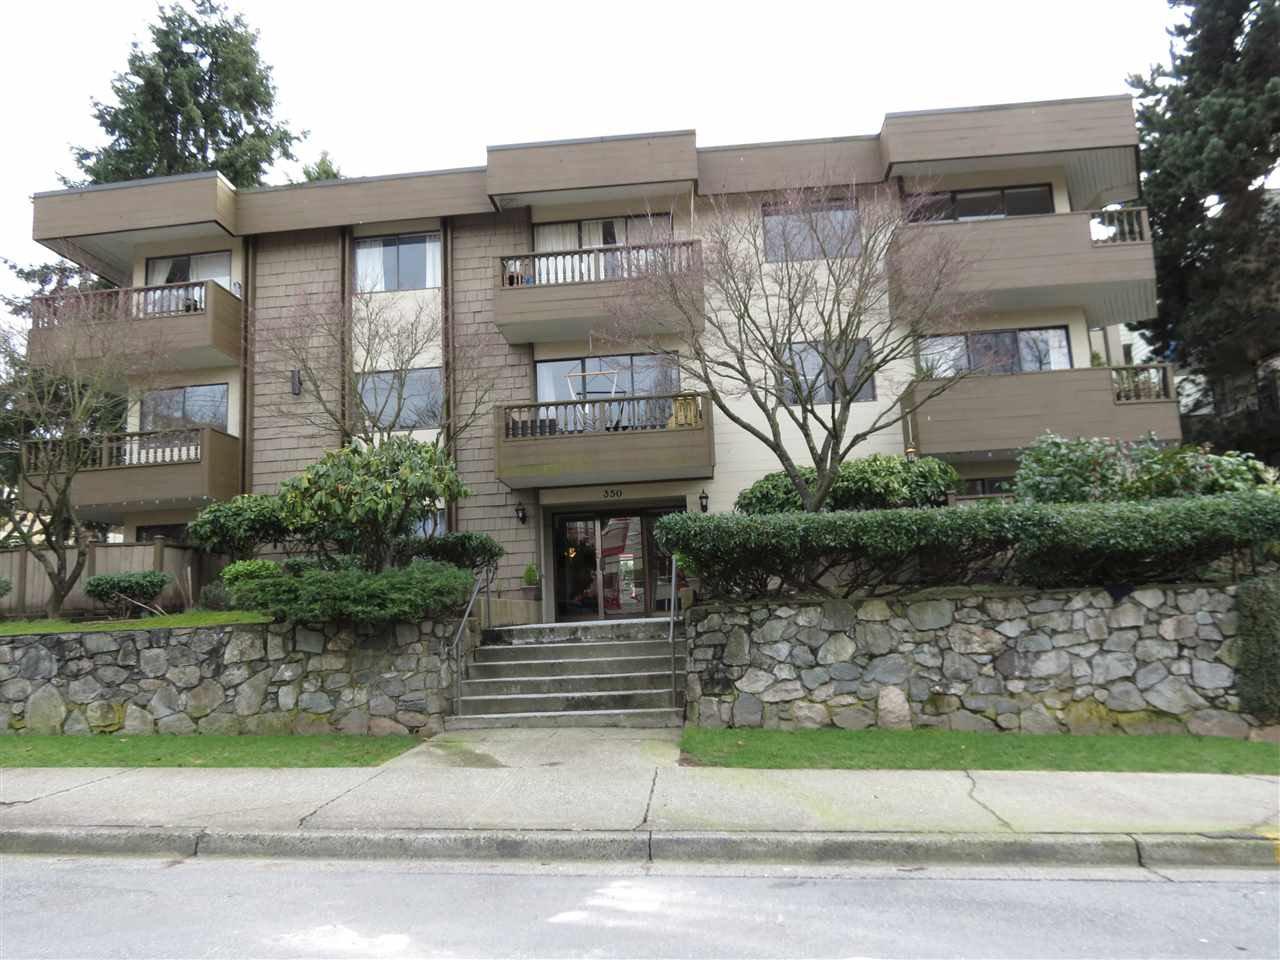 "Main Photo: 308 350 E 5TH Avenue in Vancouver: Mount Pleasant VE Condo for sale in ""Pleasant View Manor"" (Vancouver East)  : MLS®# R2437477"